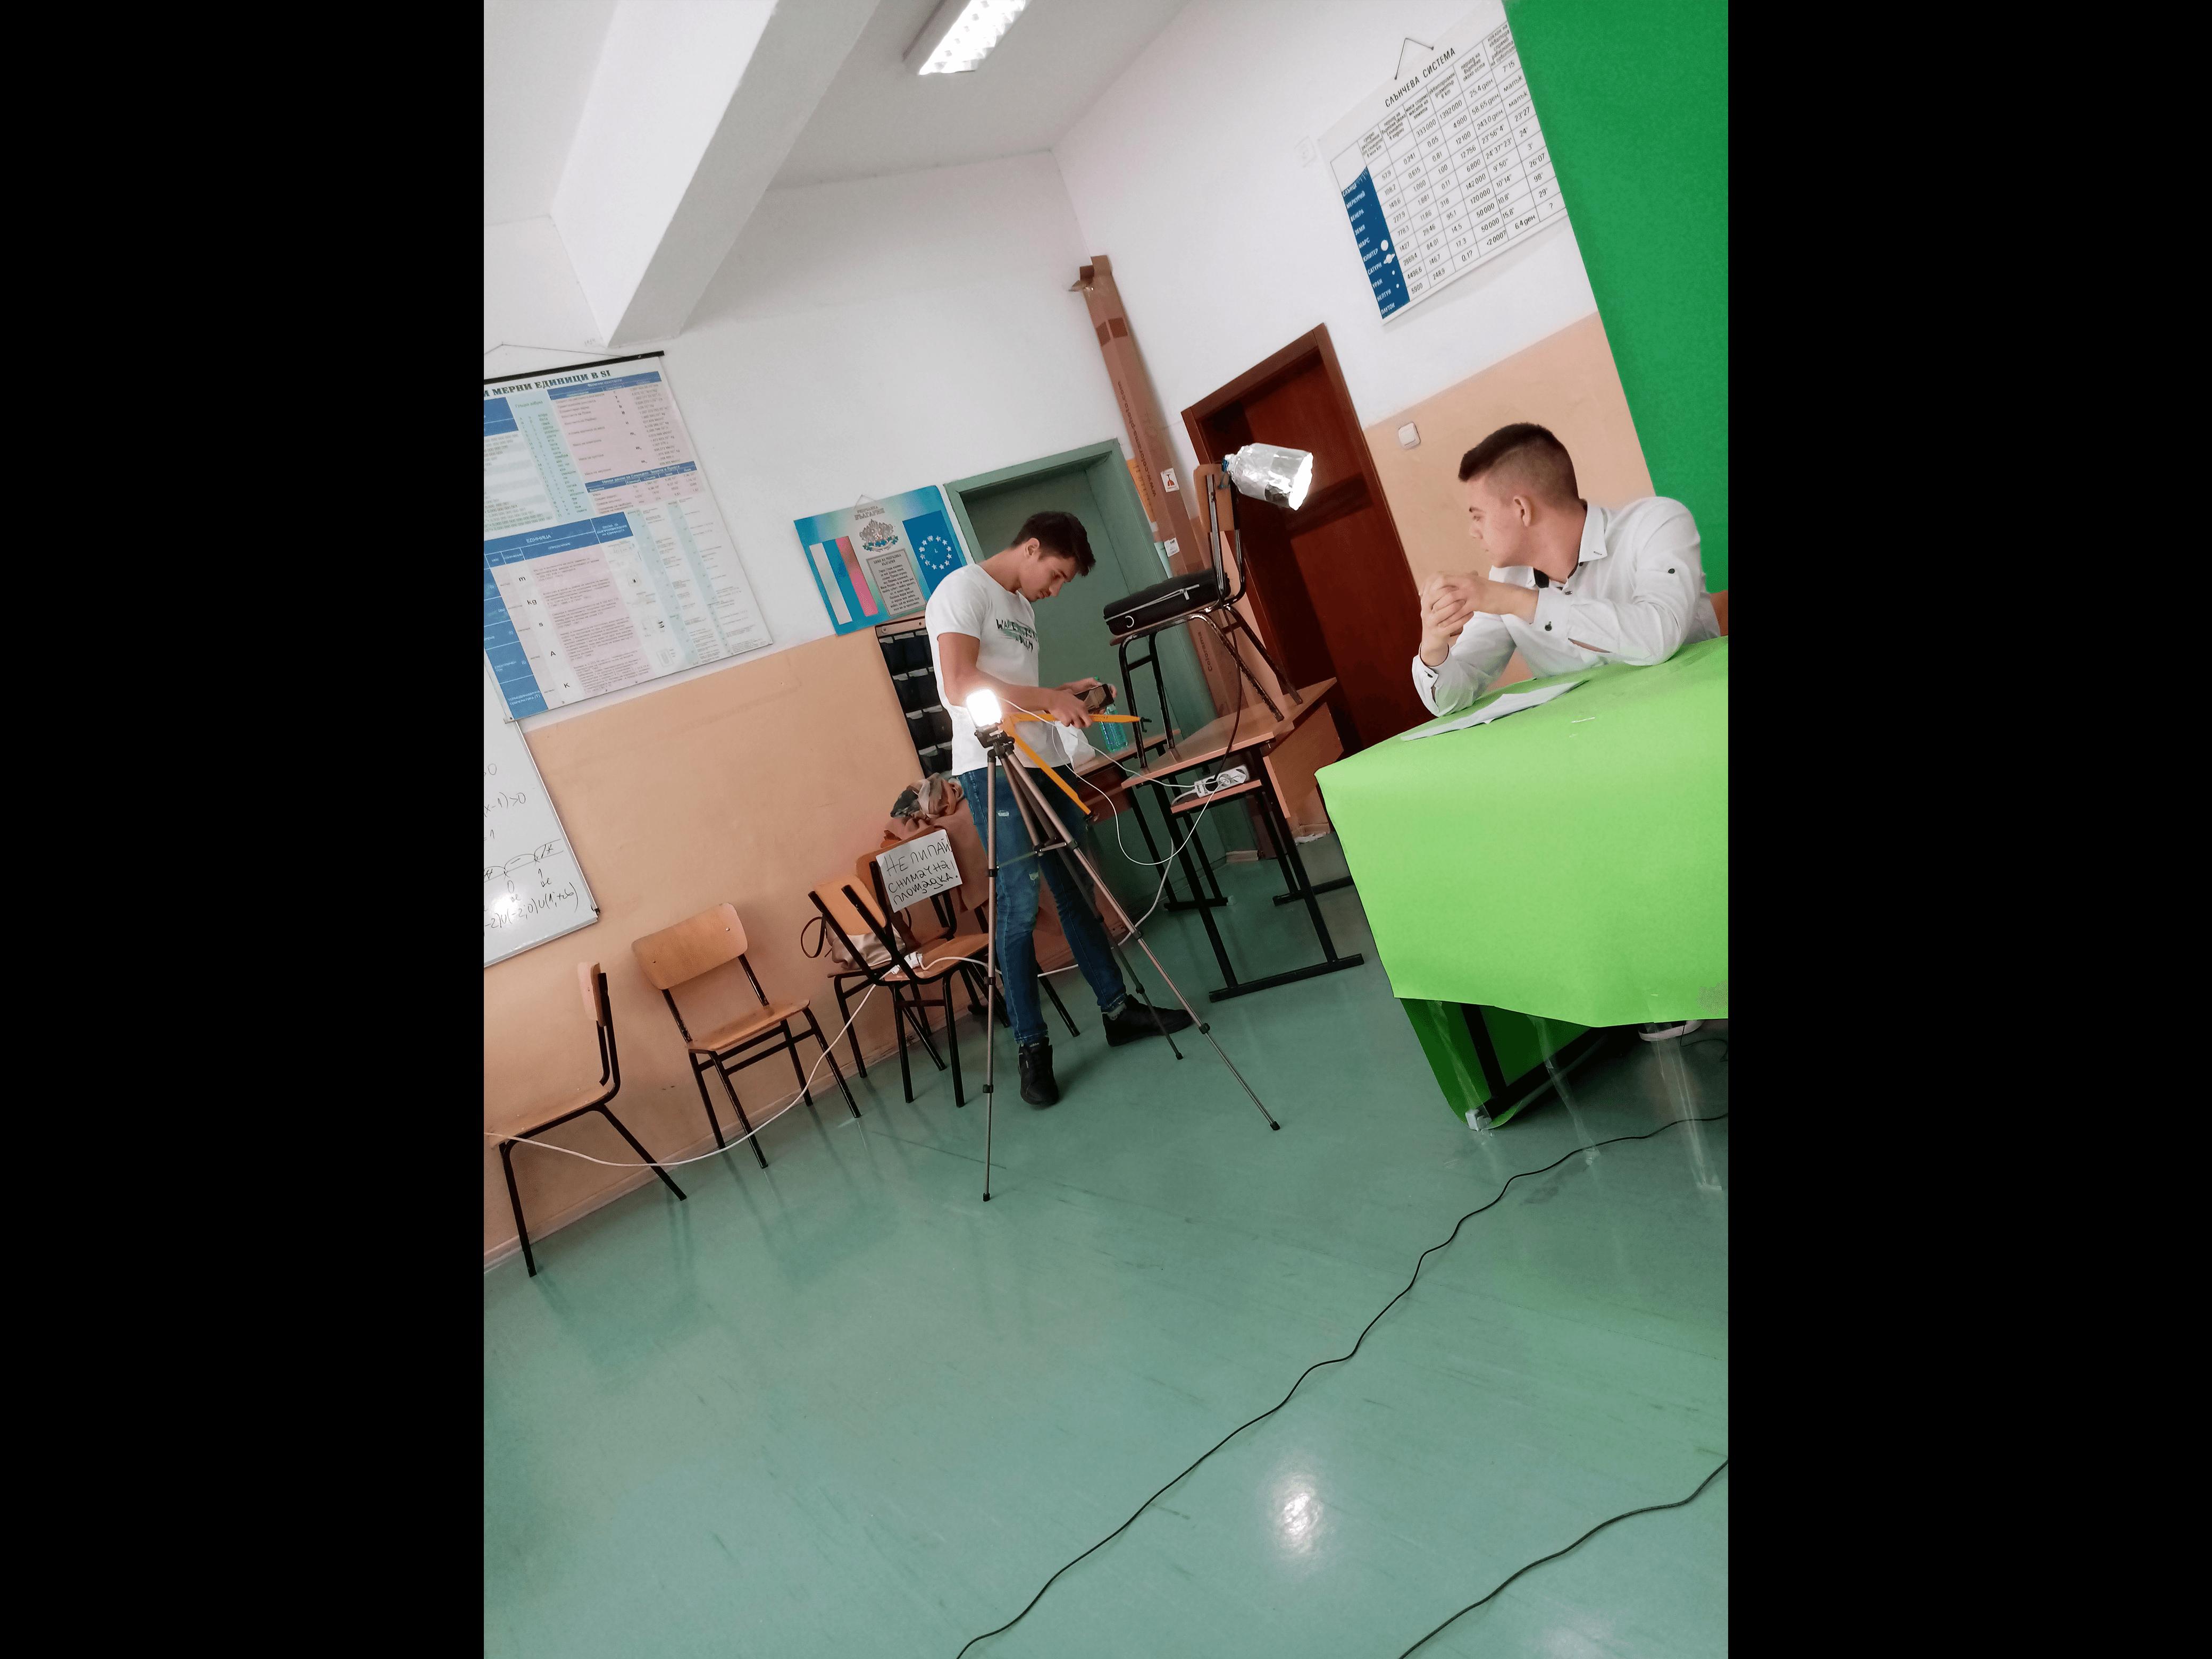 Slide 9 - ППМГ ТВ Сливен - Един ден на снимачната площадка